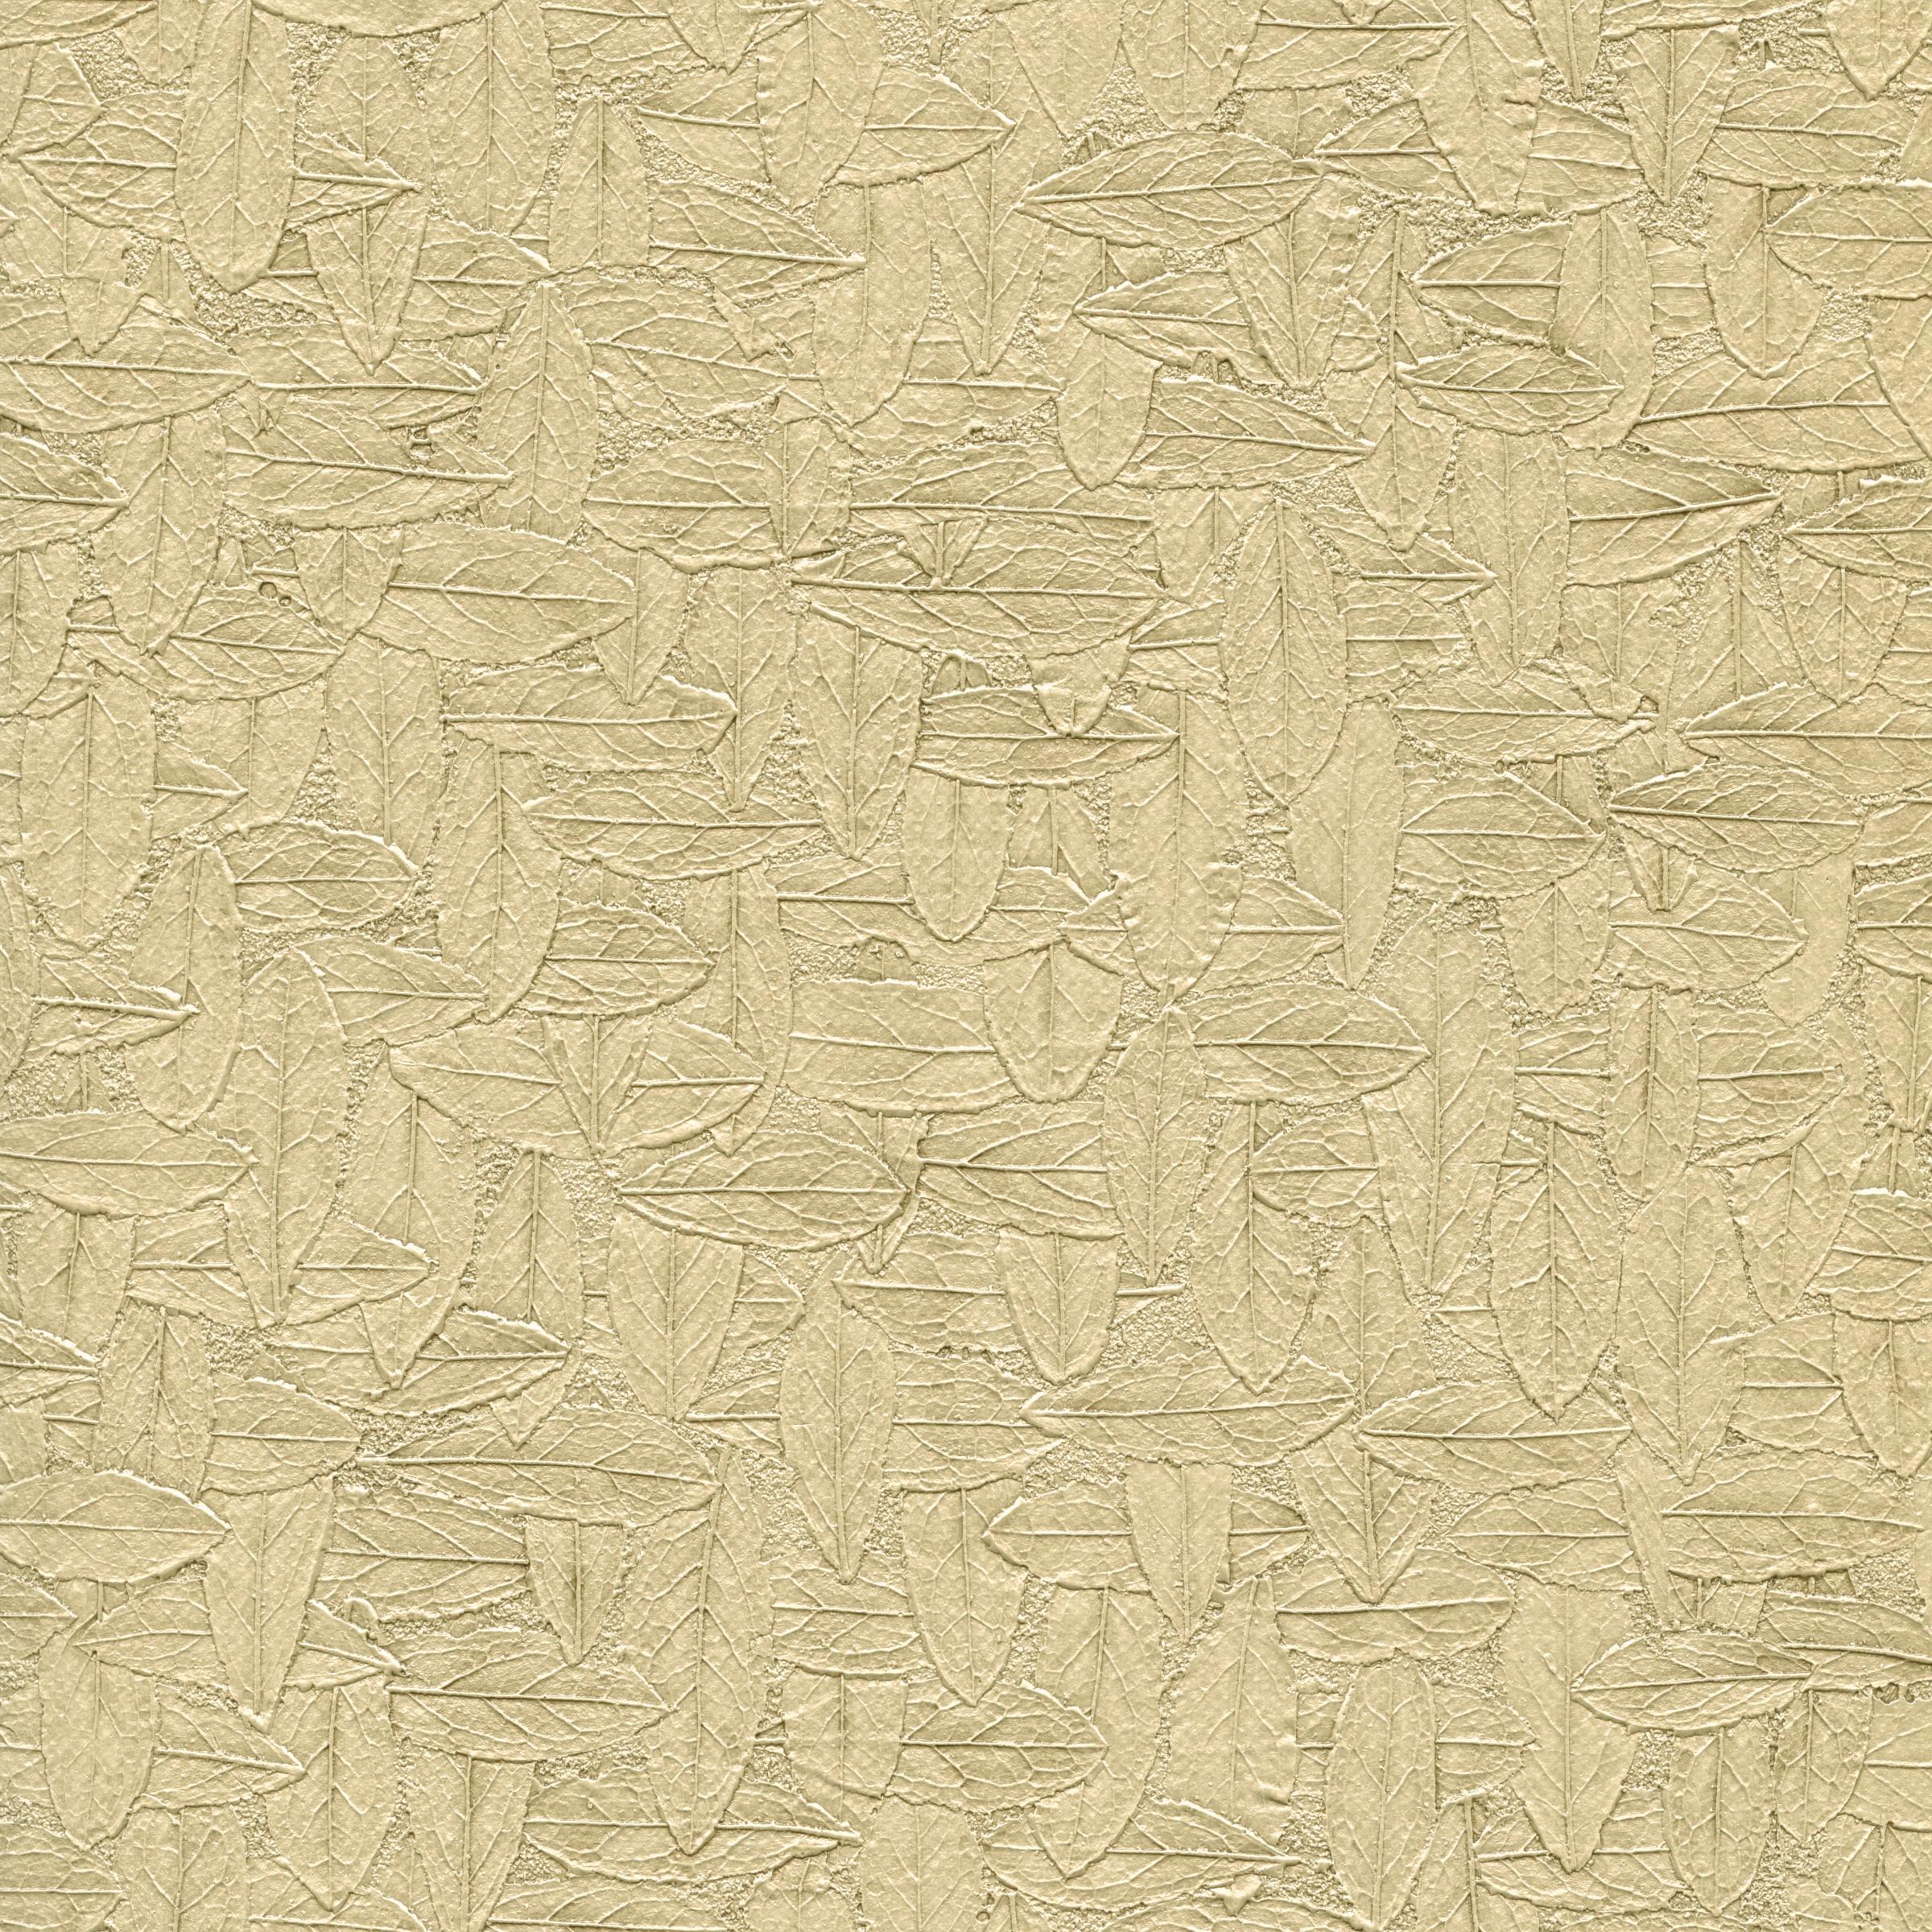 Fabric Wall Paper : Wallpaper material grasscloth